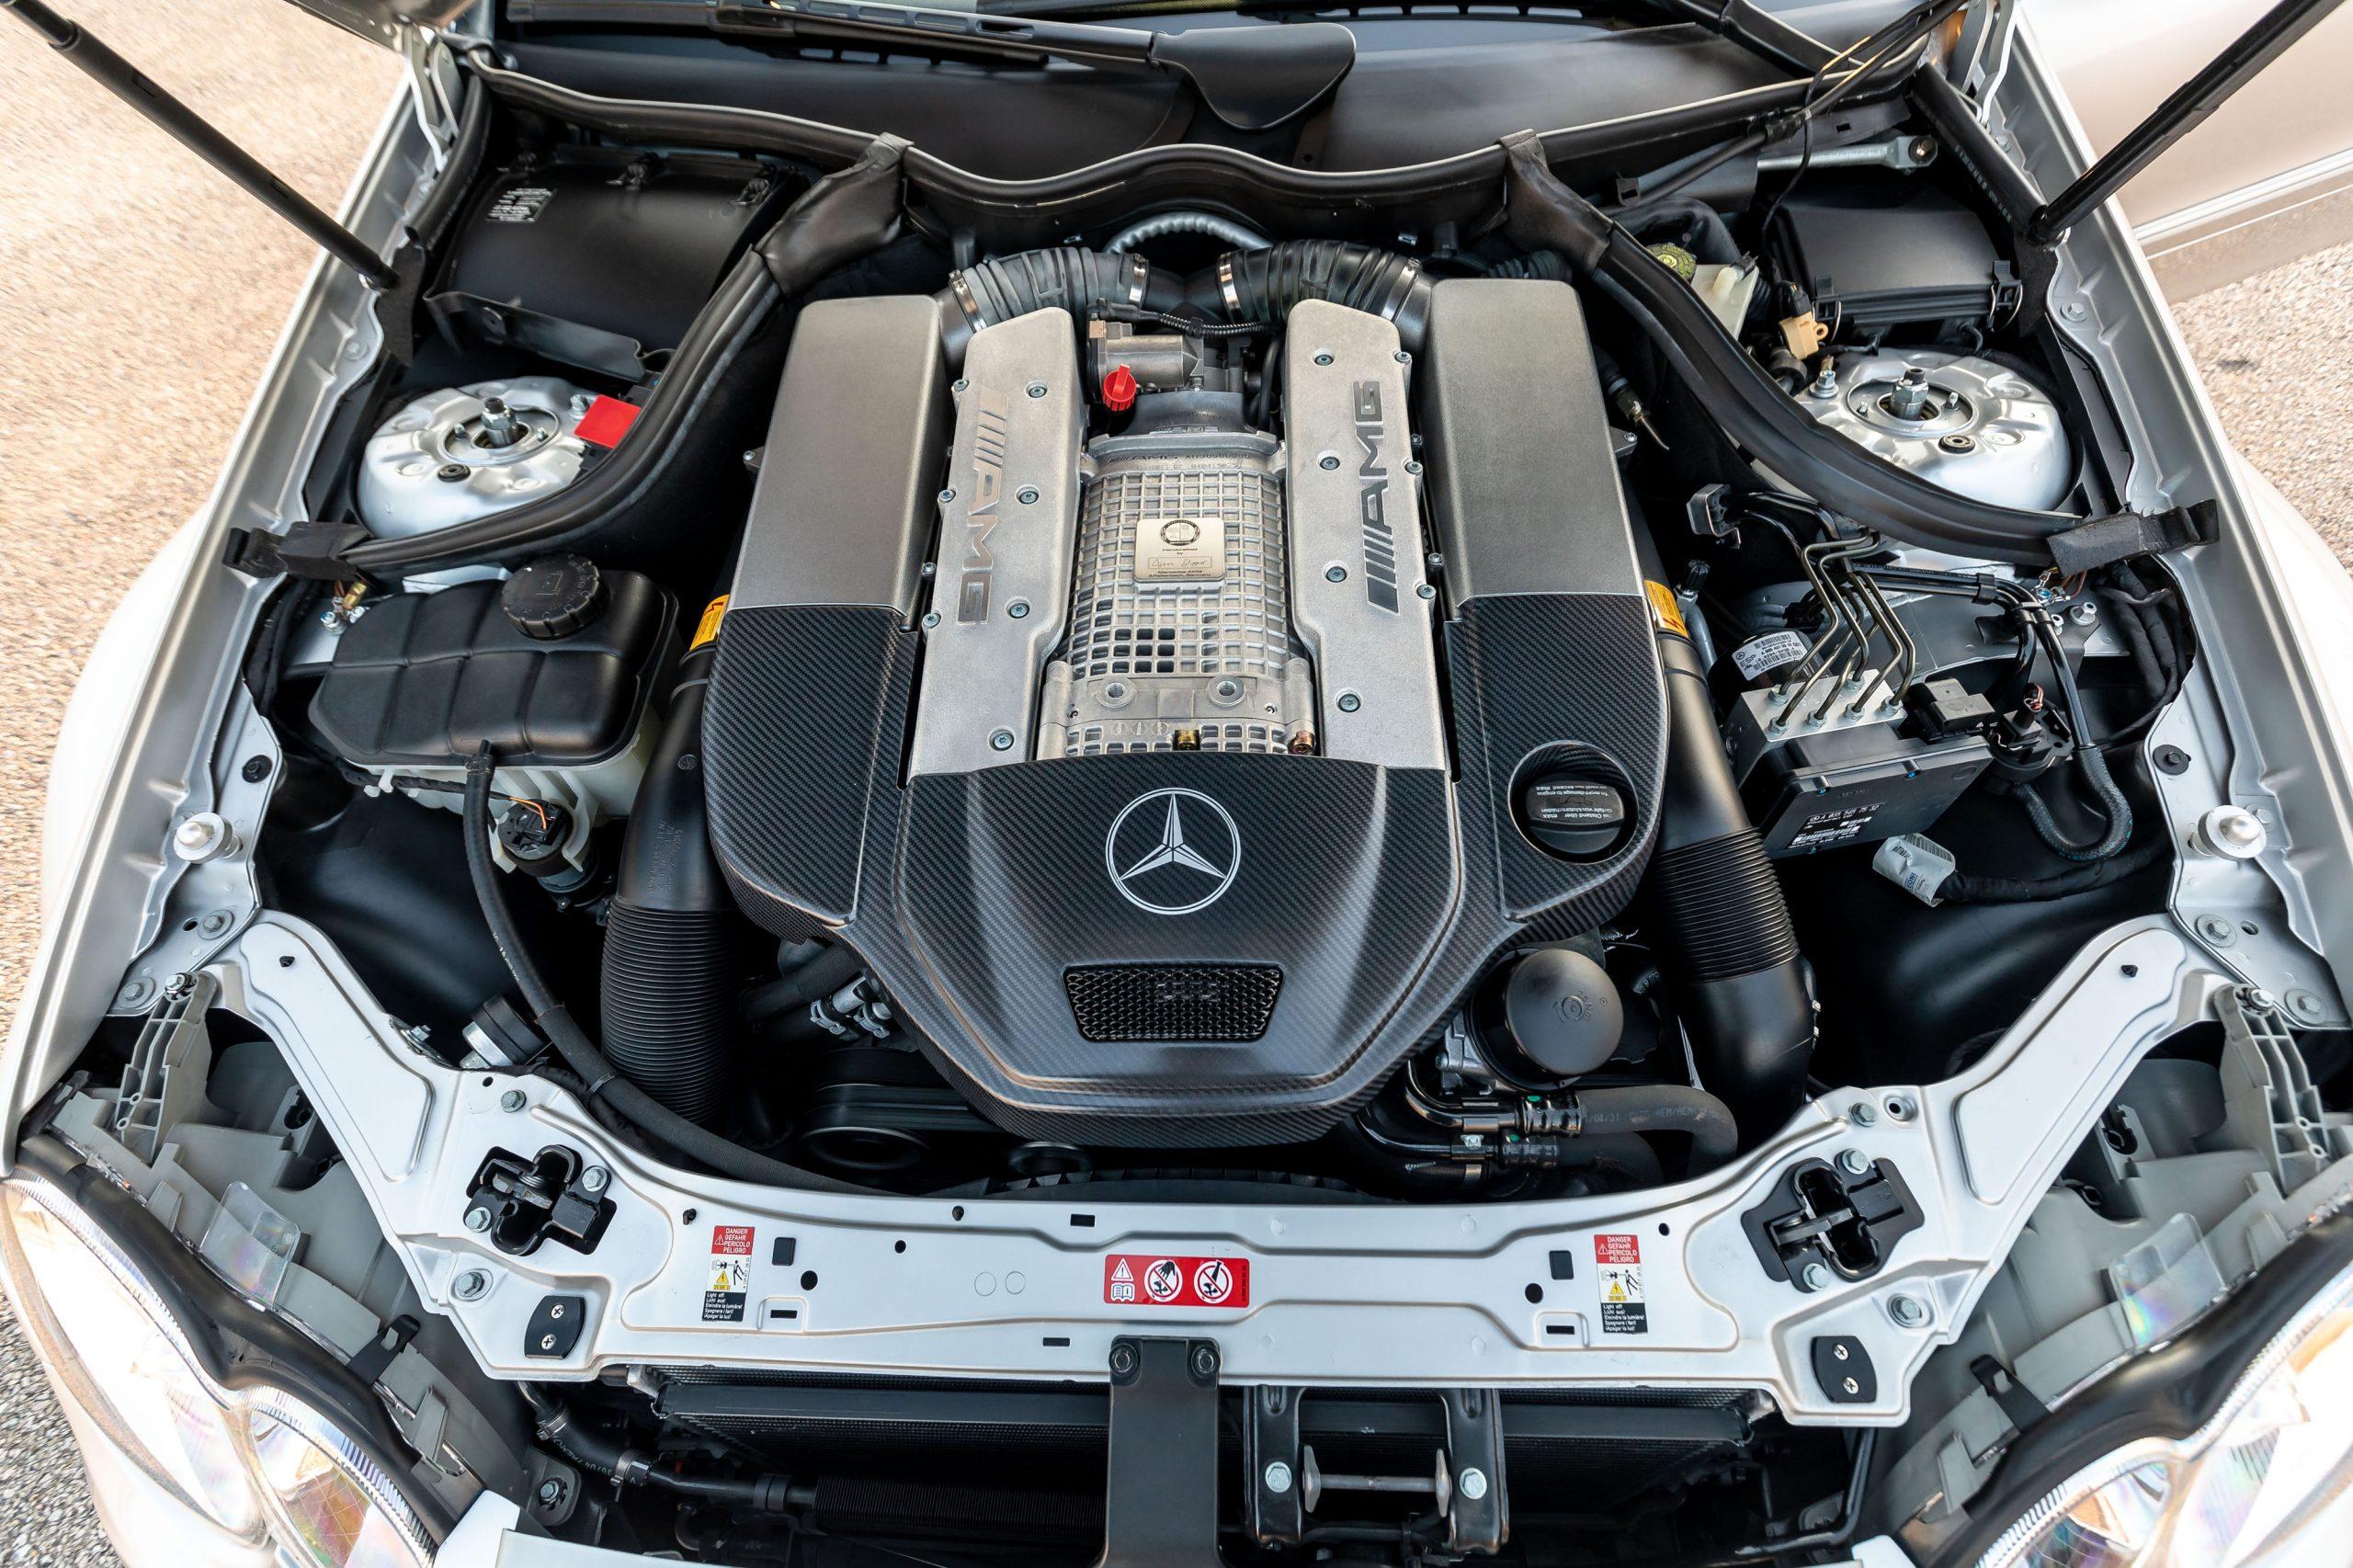 2005 Mercedes Benz CLK DTM AMG engine bay